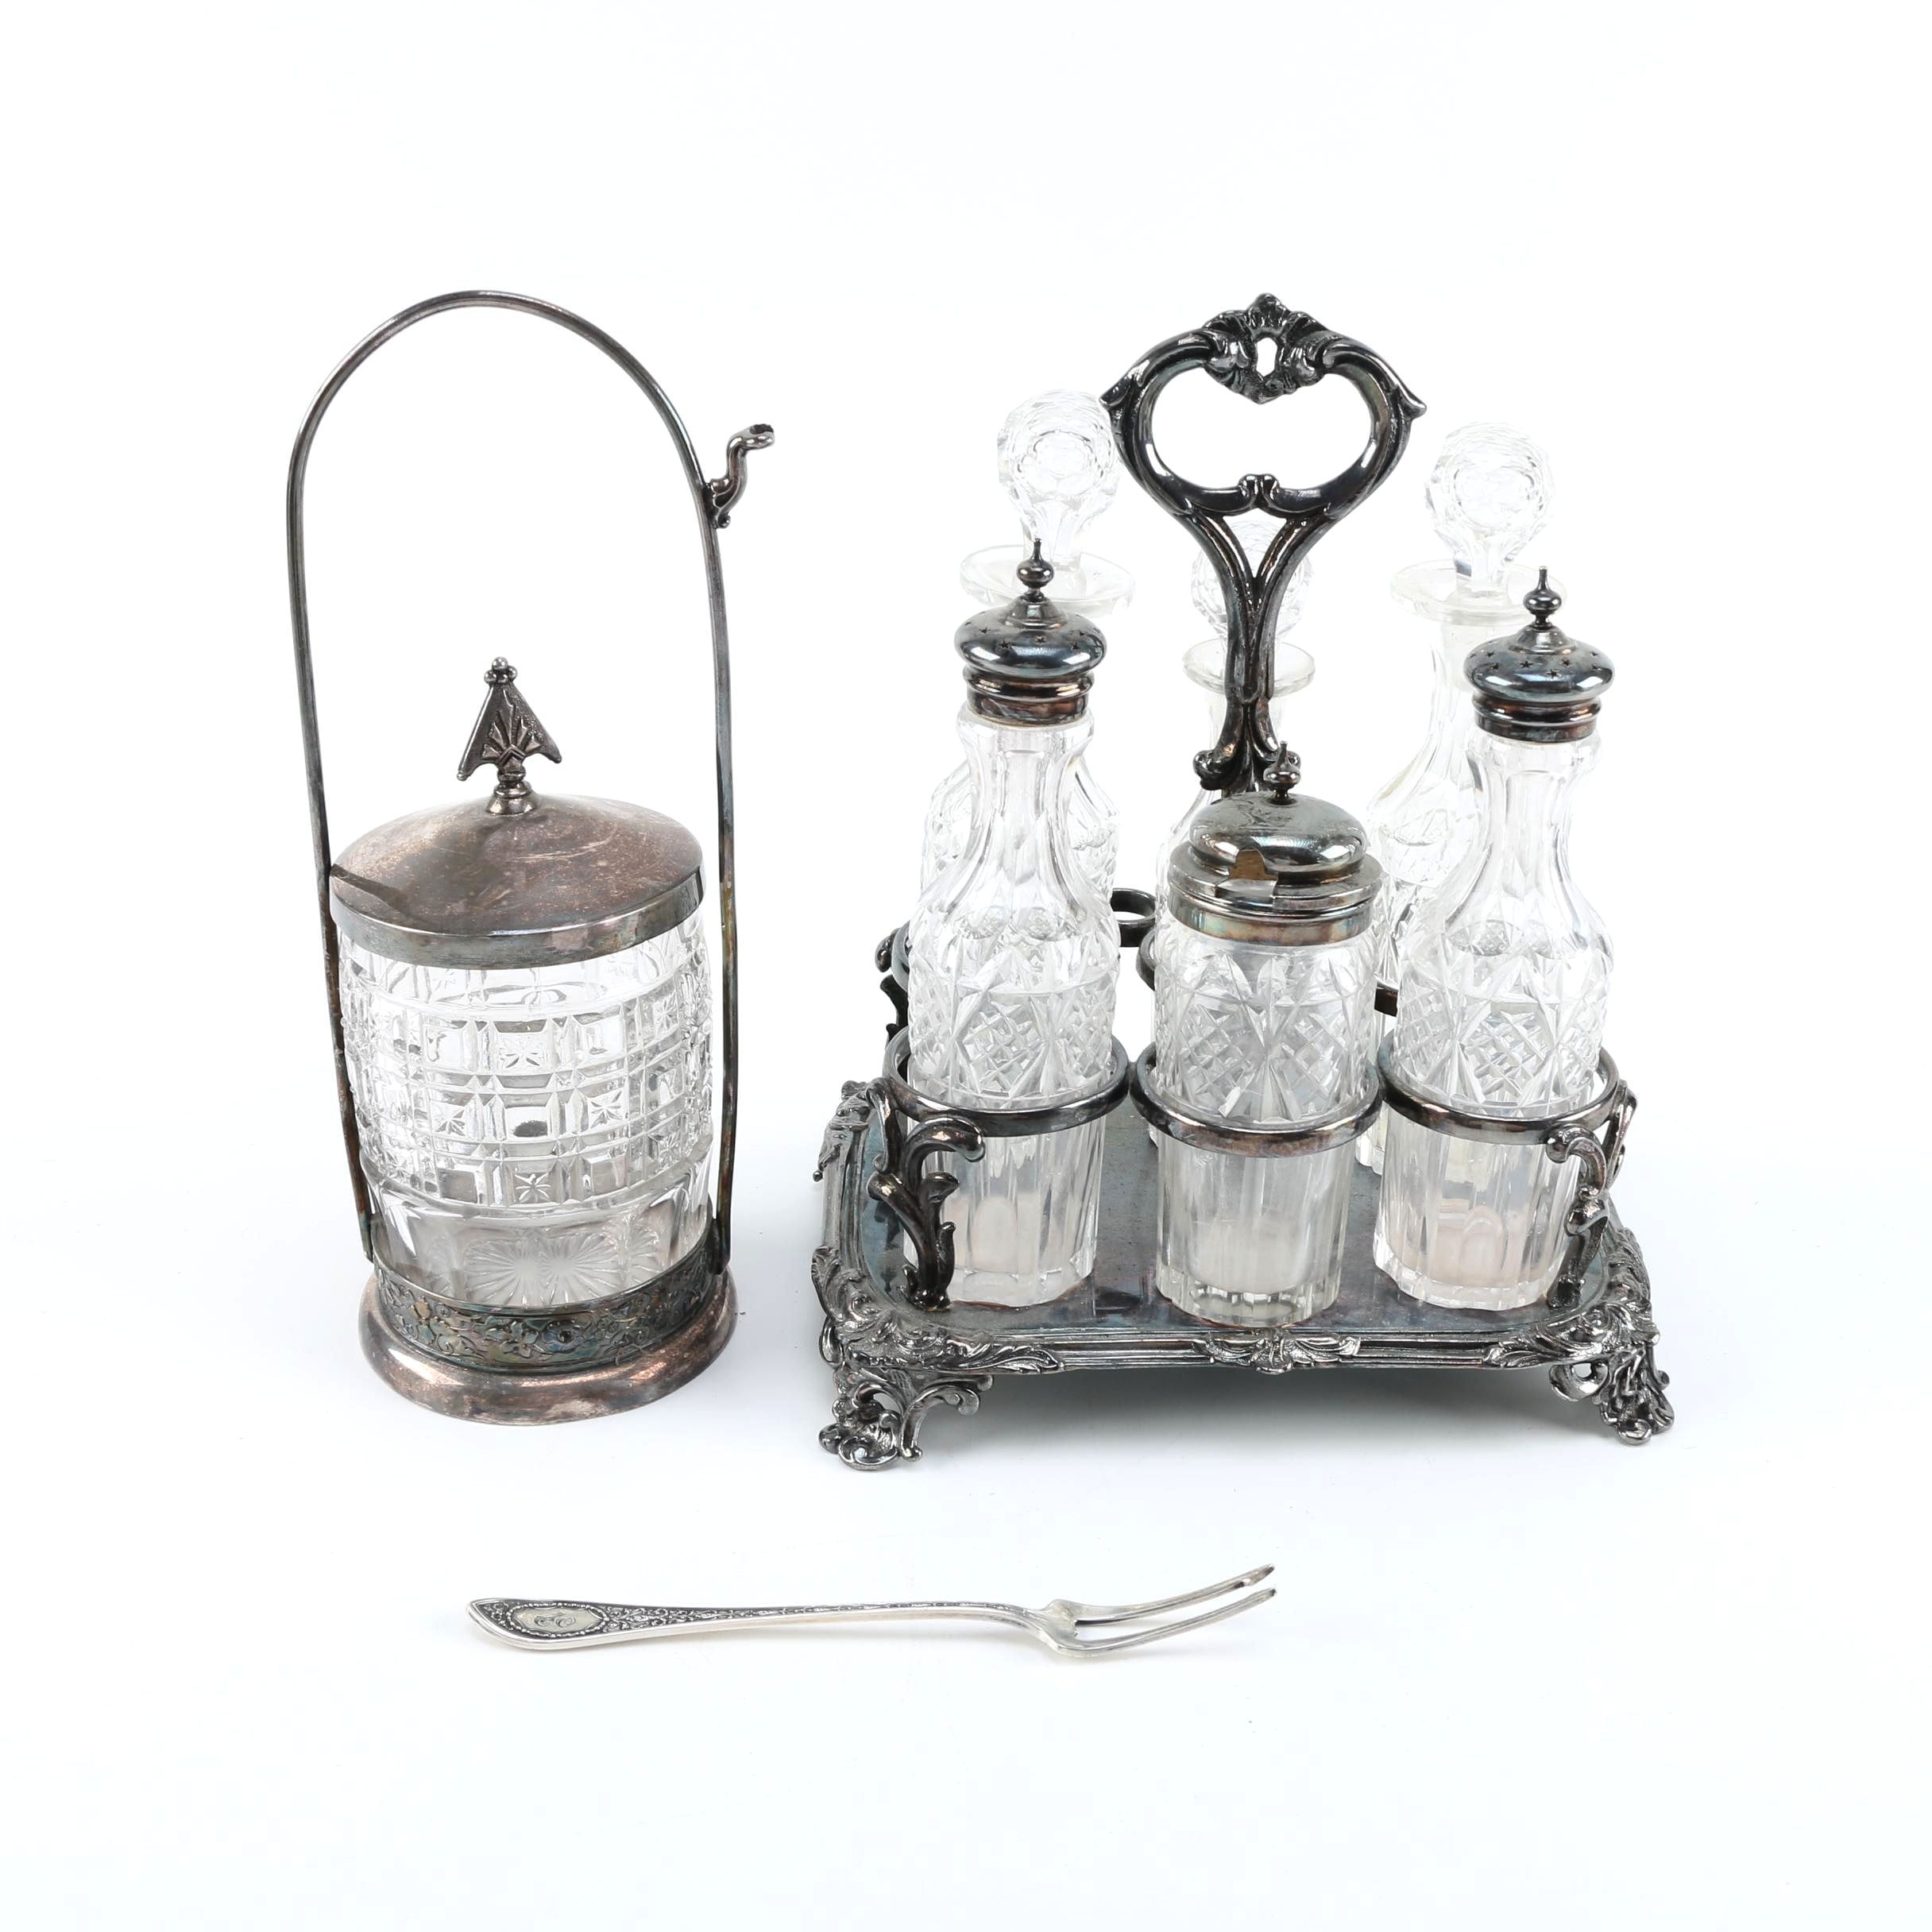 Vintage Silver Plate Cruet Set and Pickle Castor With Sterling Pickle Fork